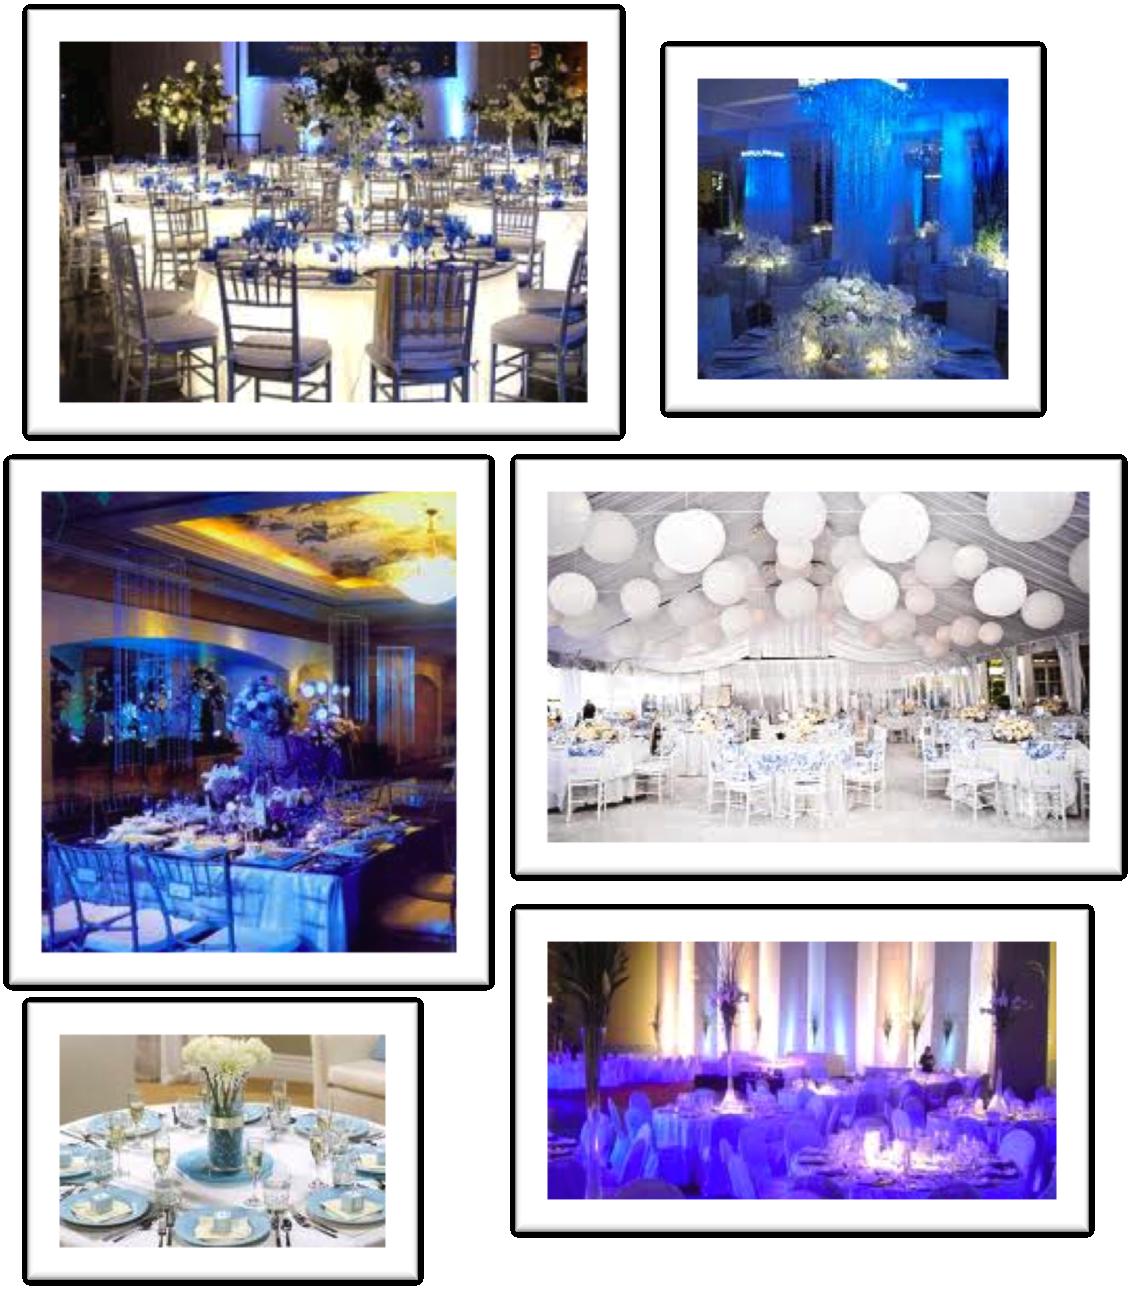 Bodas Decoracion Azul ~ Decoraci?n bodas azul y blanco www d bodas com